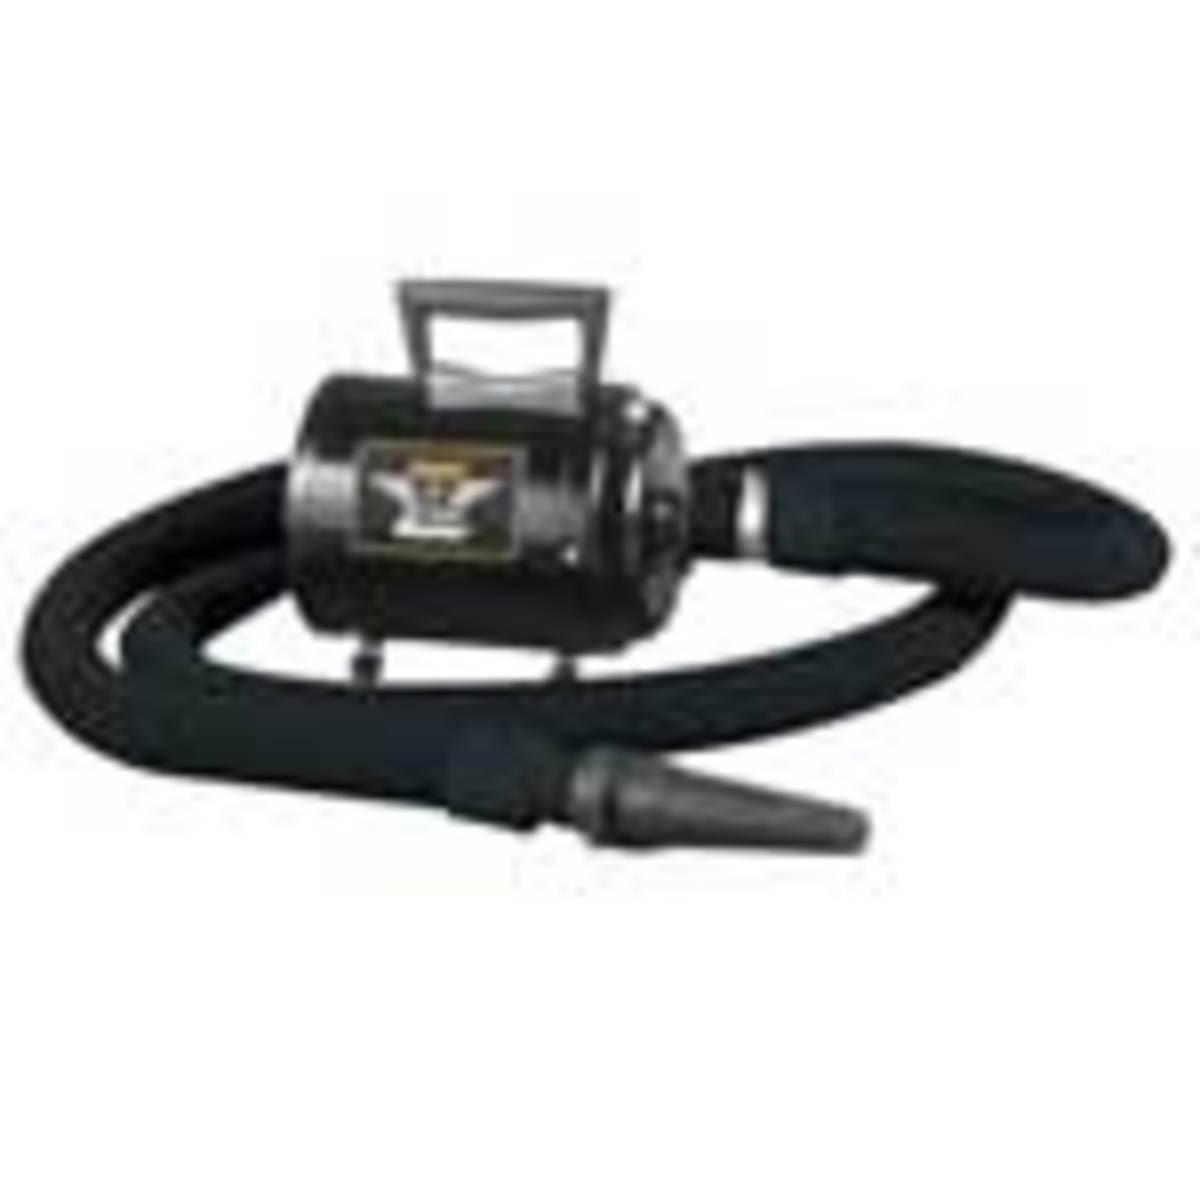 Force dryer. Air volume: 130 CFM. Air speed: 29,250 FPM. Heat: warm air (no heating element).  Motor: 4.0 HP. Amps: 9.5.